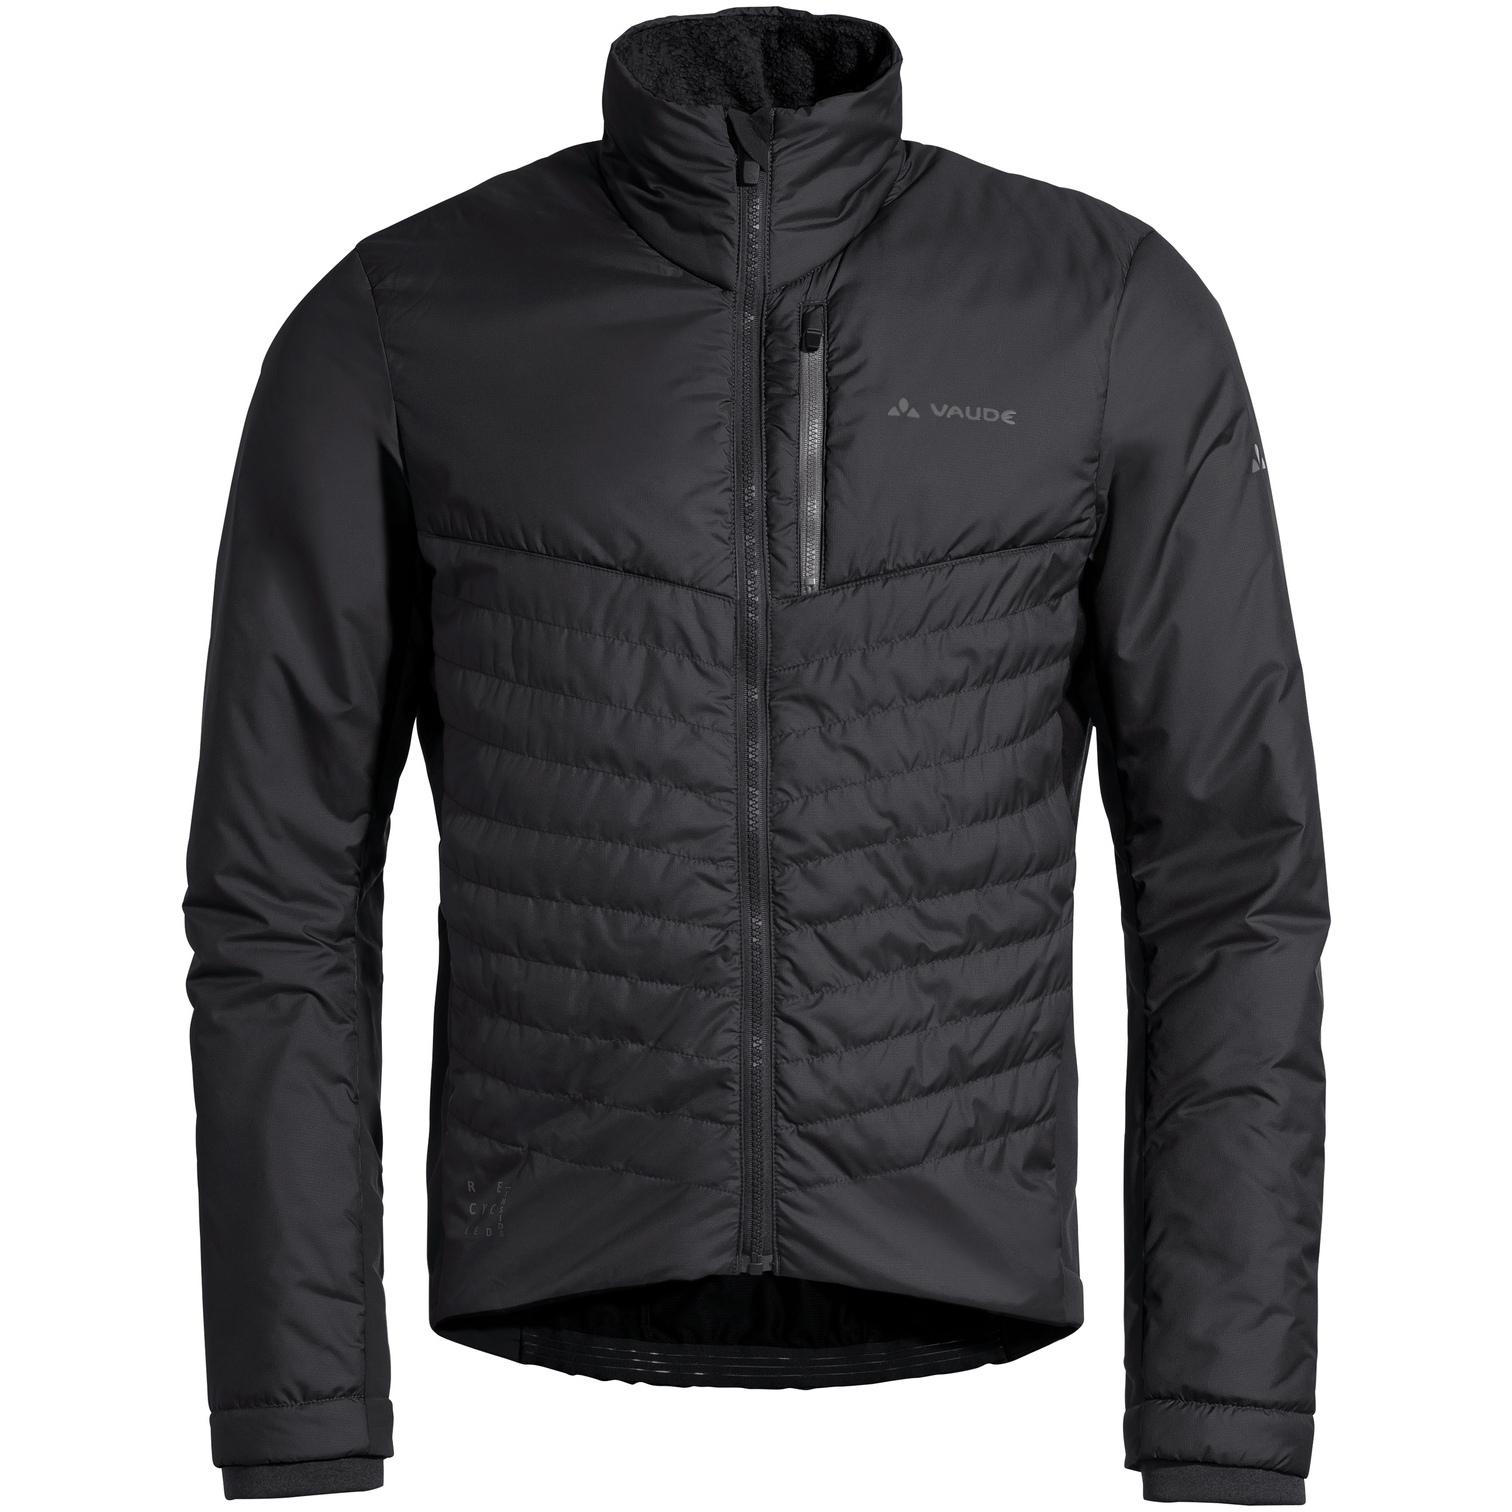 Image of Vaude Men's Posta Insulation Jacket - black